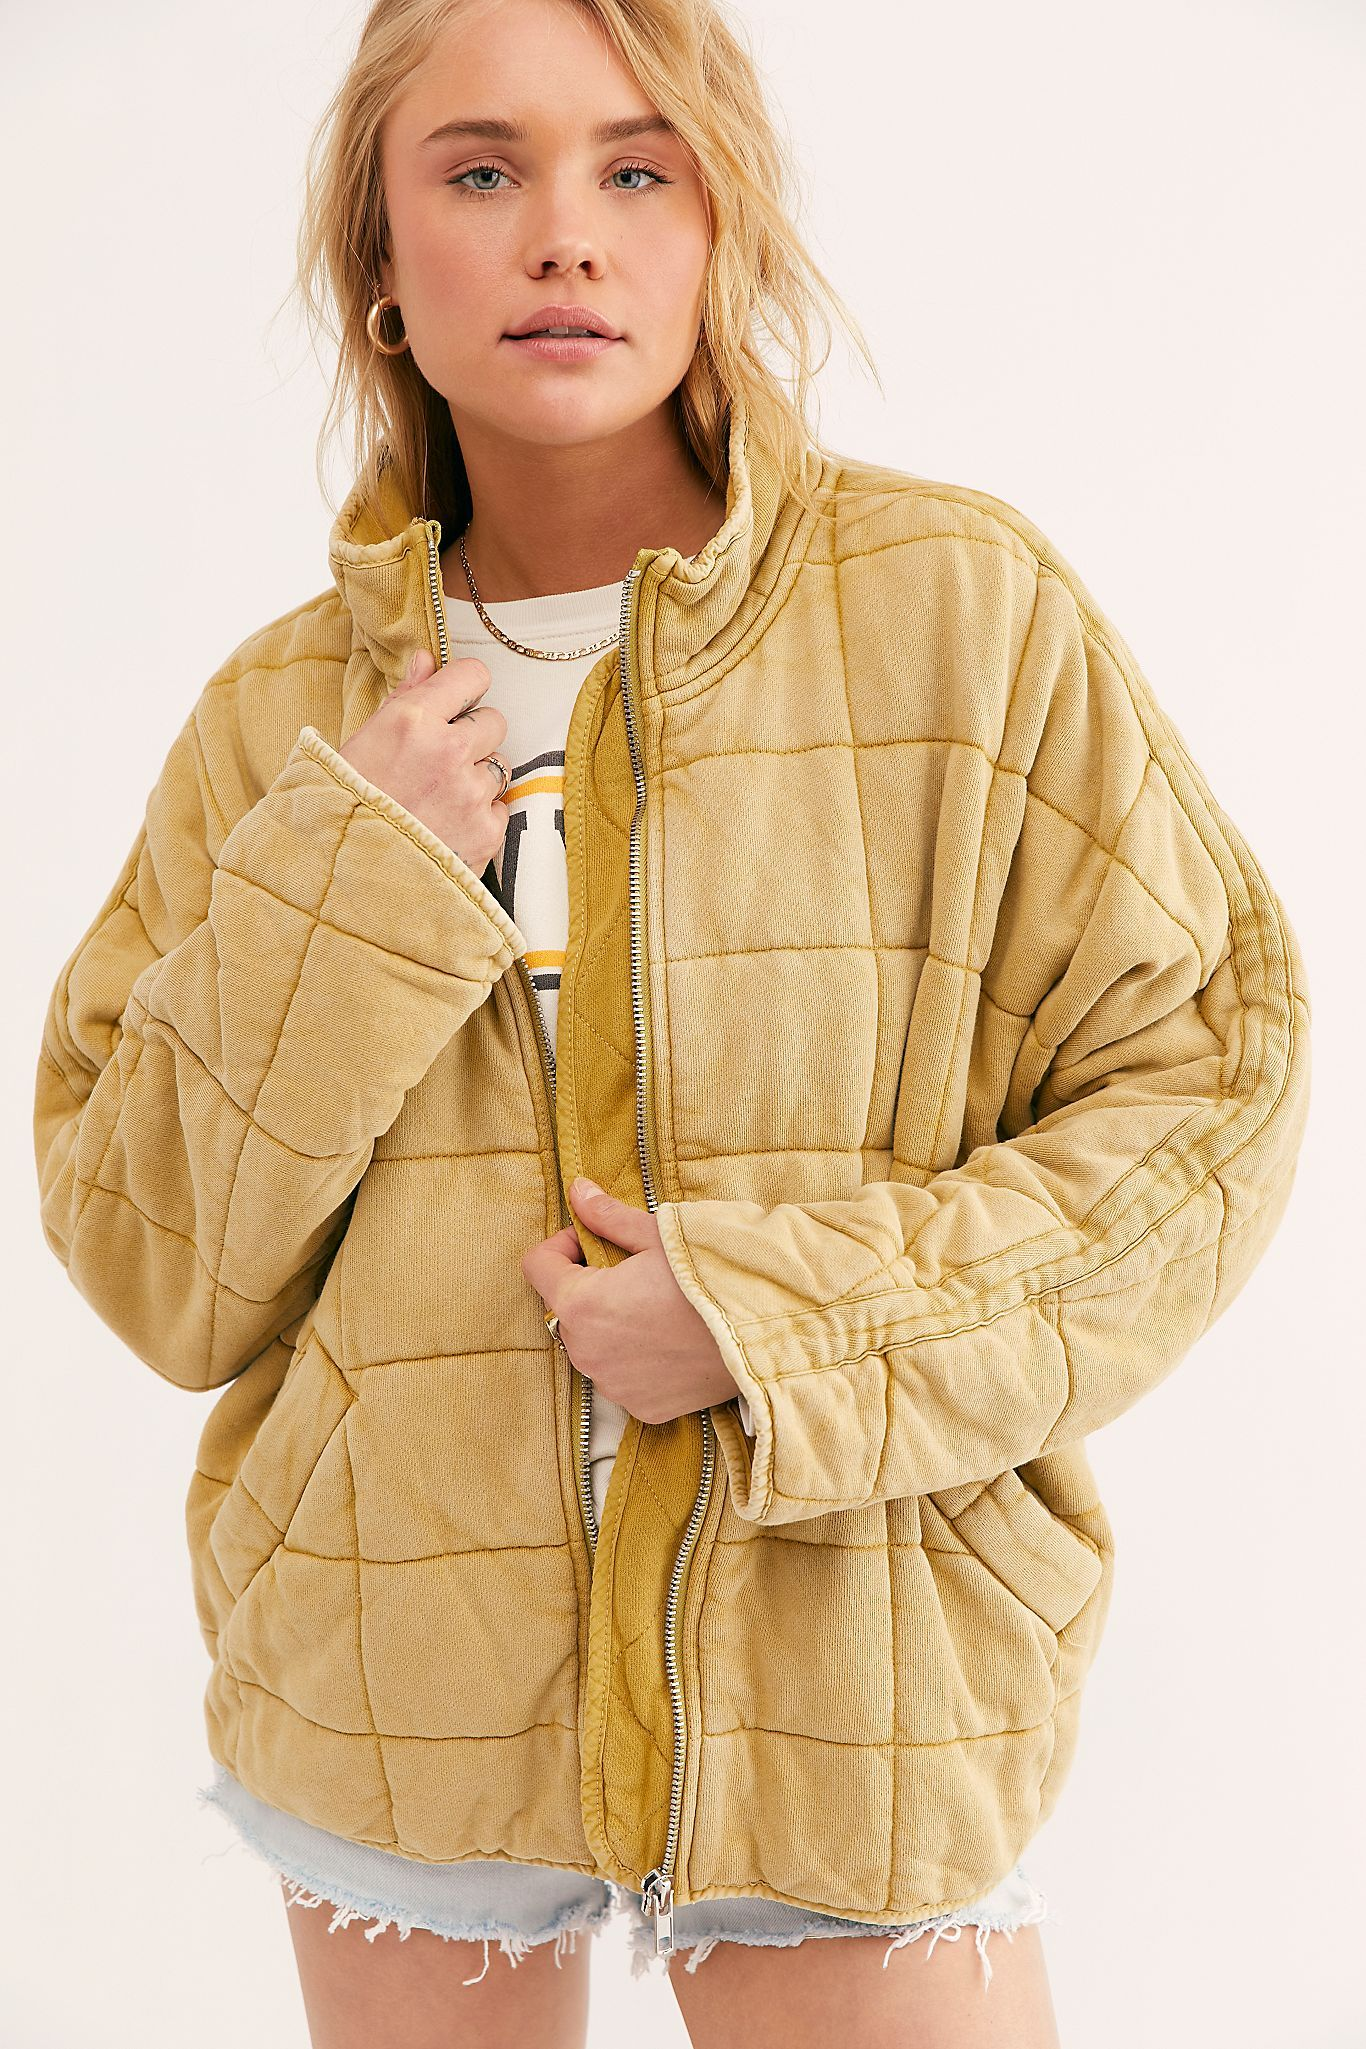 Dolman Quilted Knit Jacket Knit Jacket Womens Fashion Jackets Coats Jackets Women [ 2049 x 1366 Pixel ]